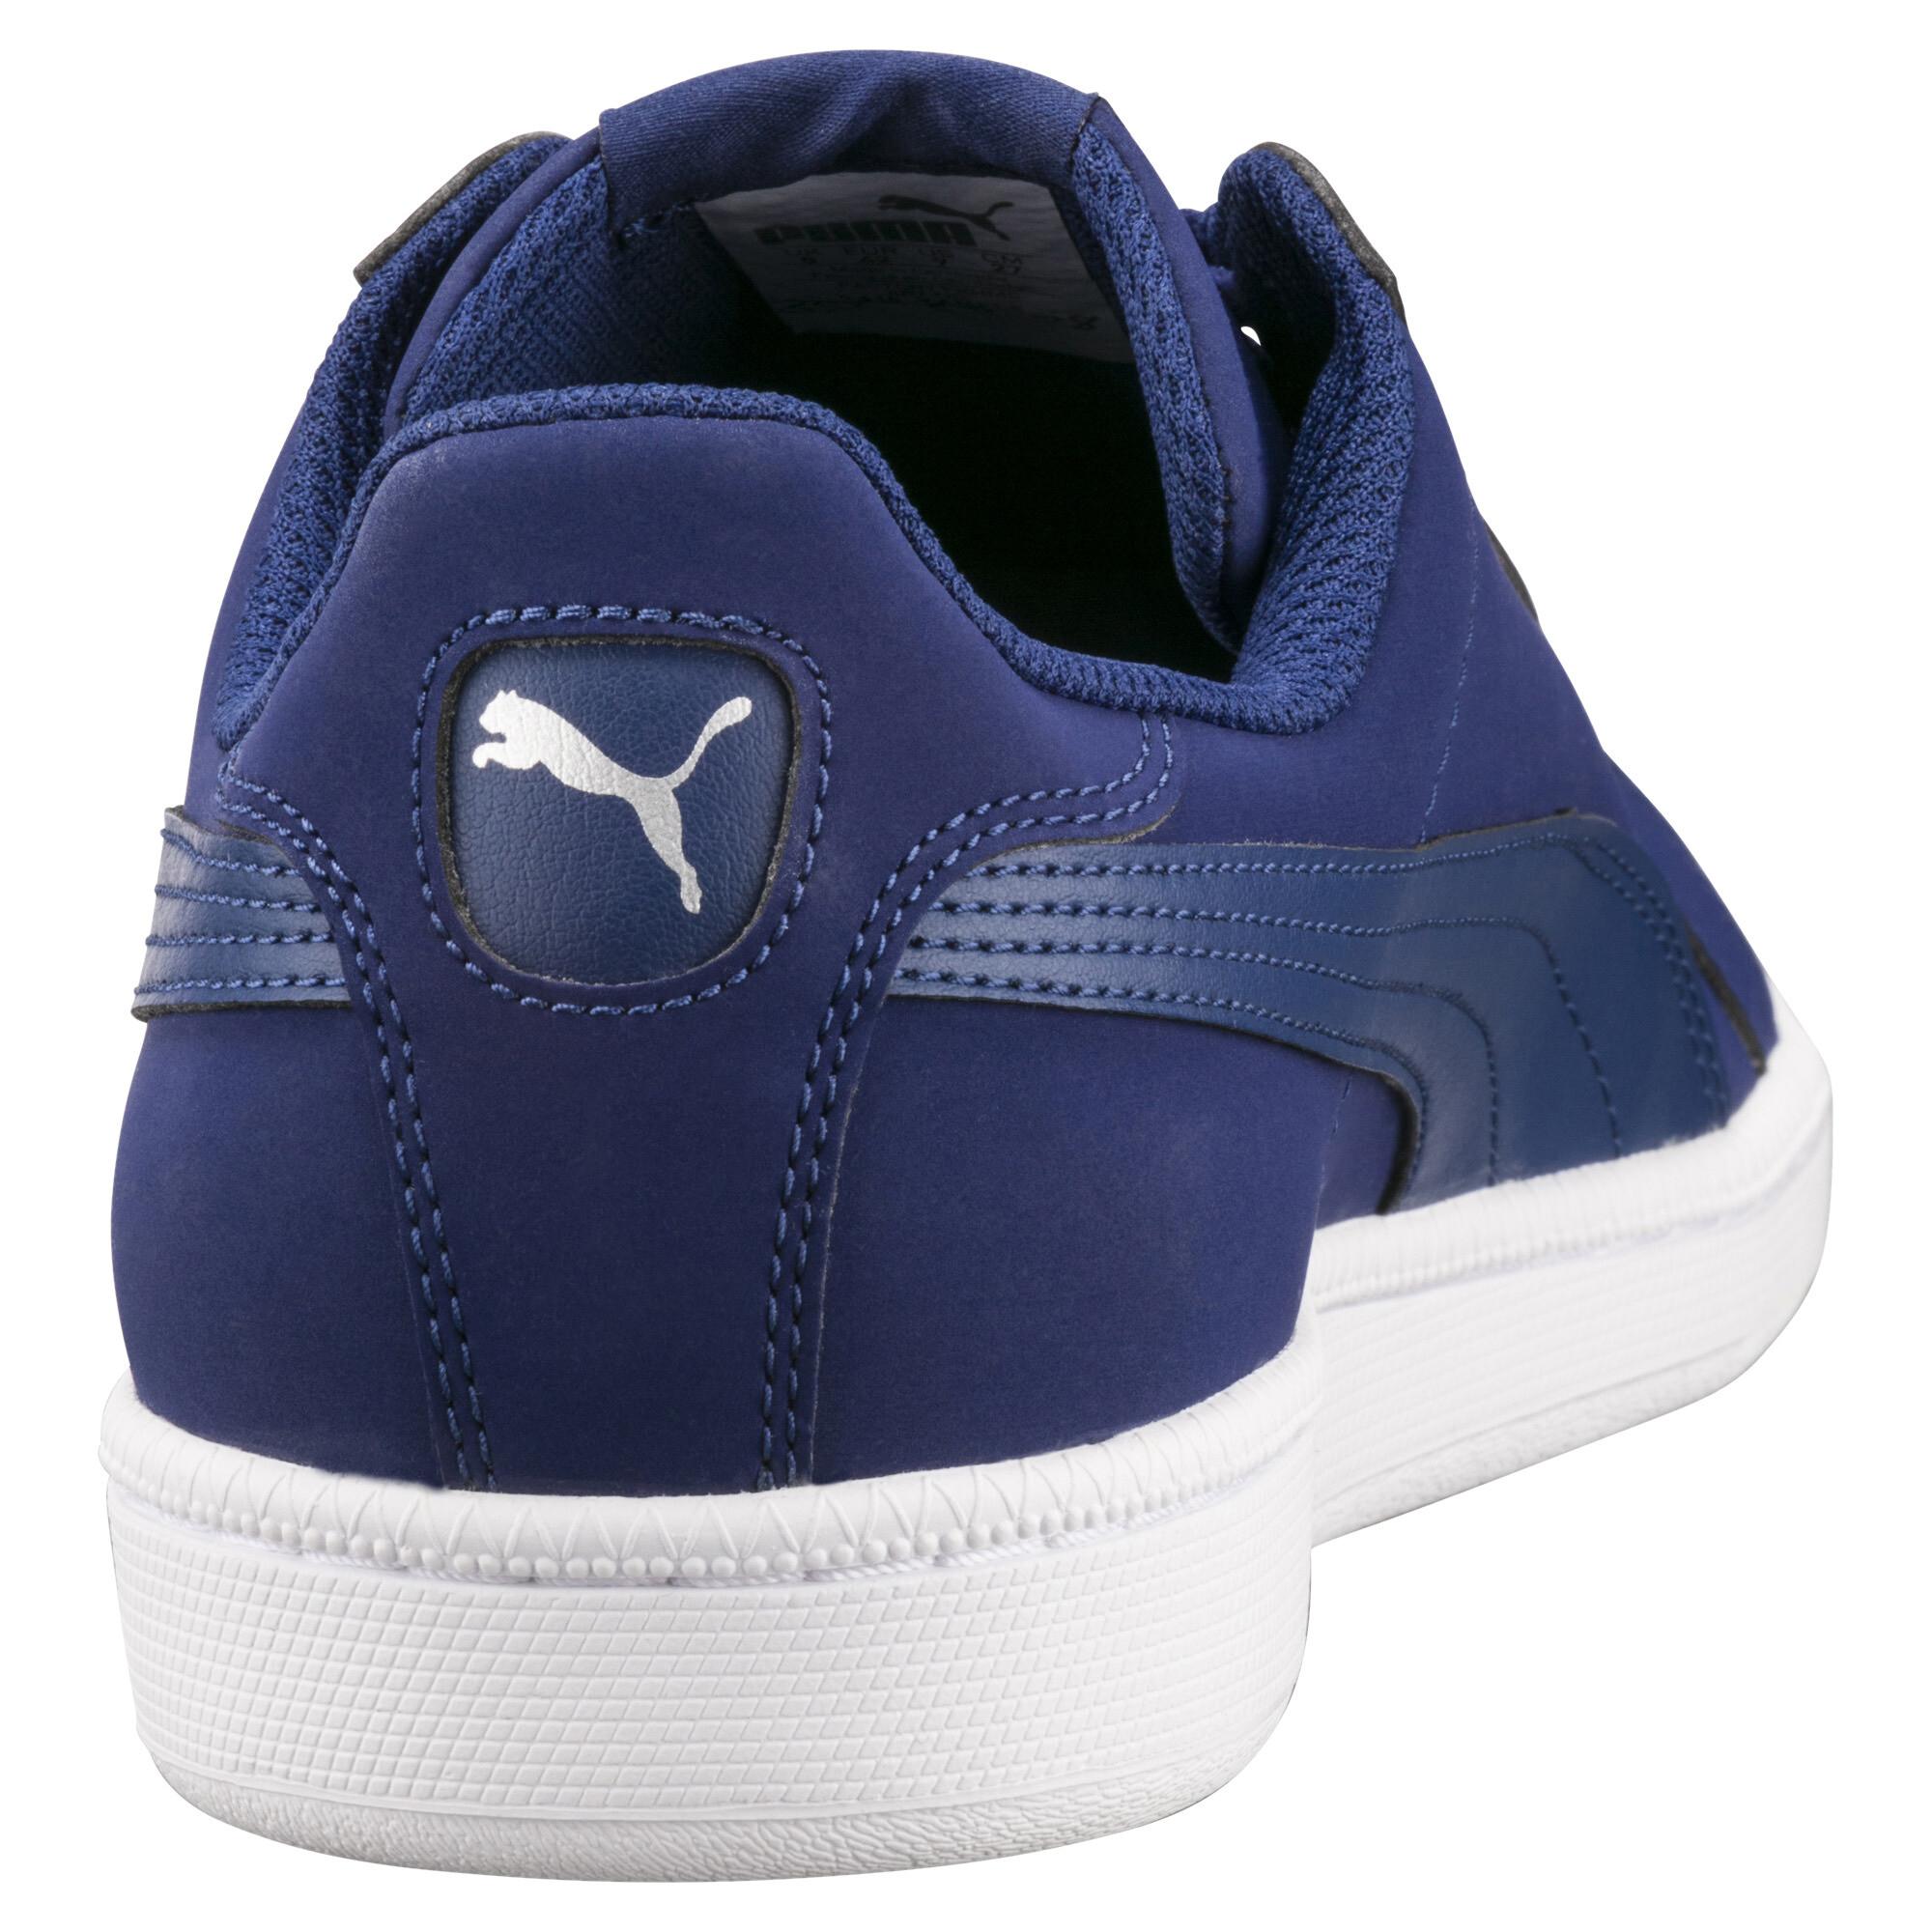 Indexbild 3 - PUMA Smash Buck Sneaker Unisex Schuhe Sport Classics Neu